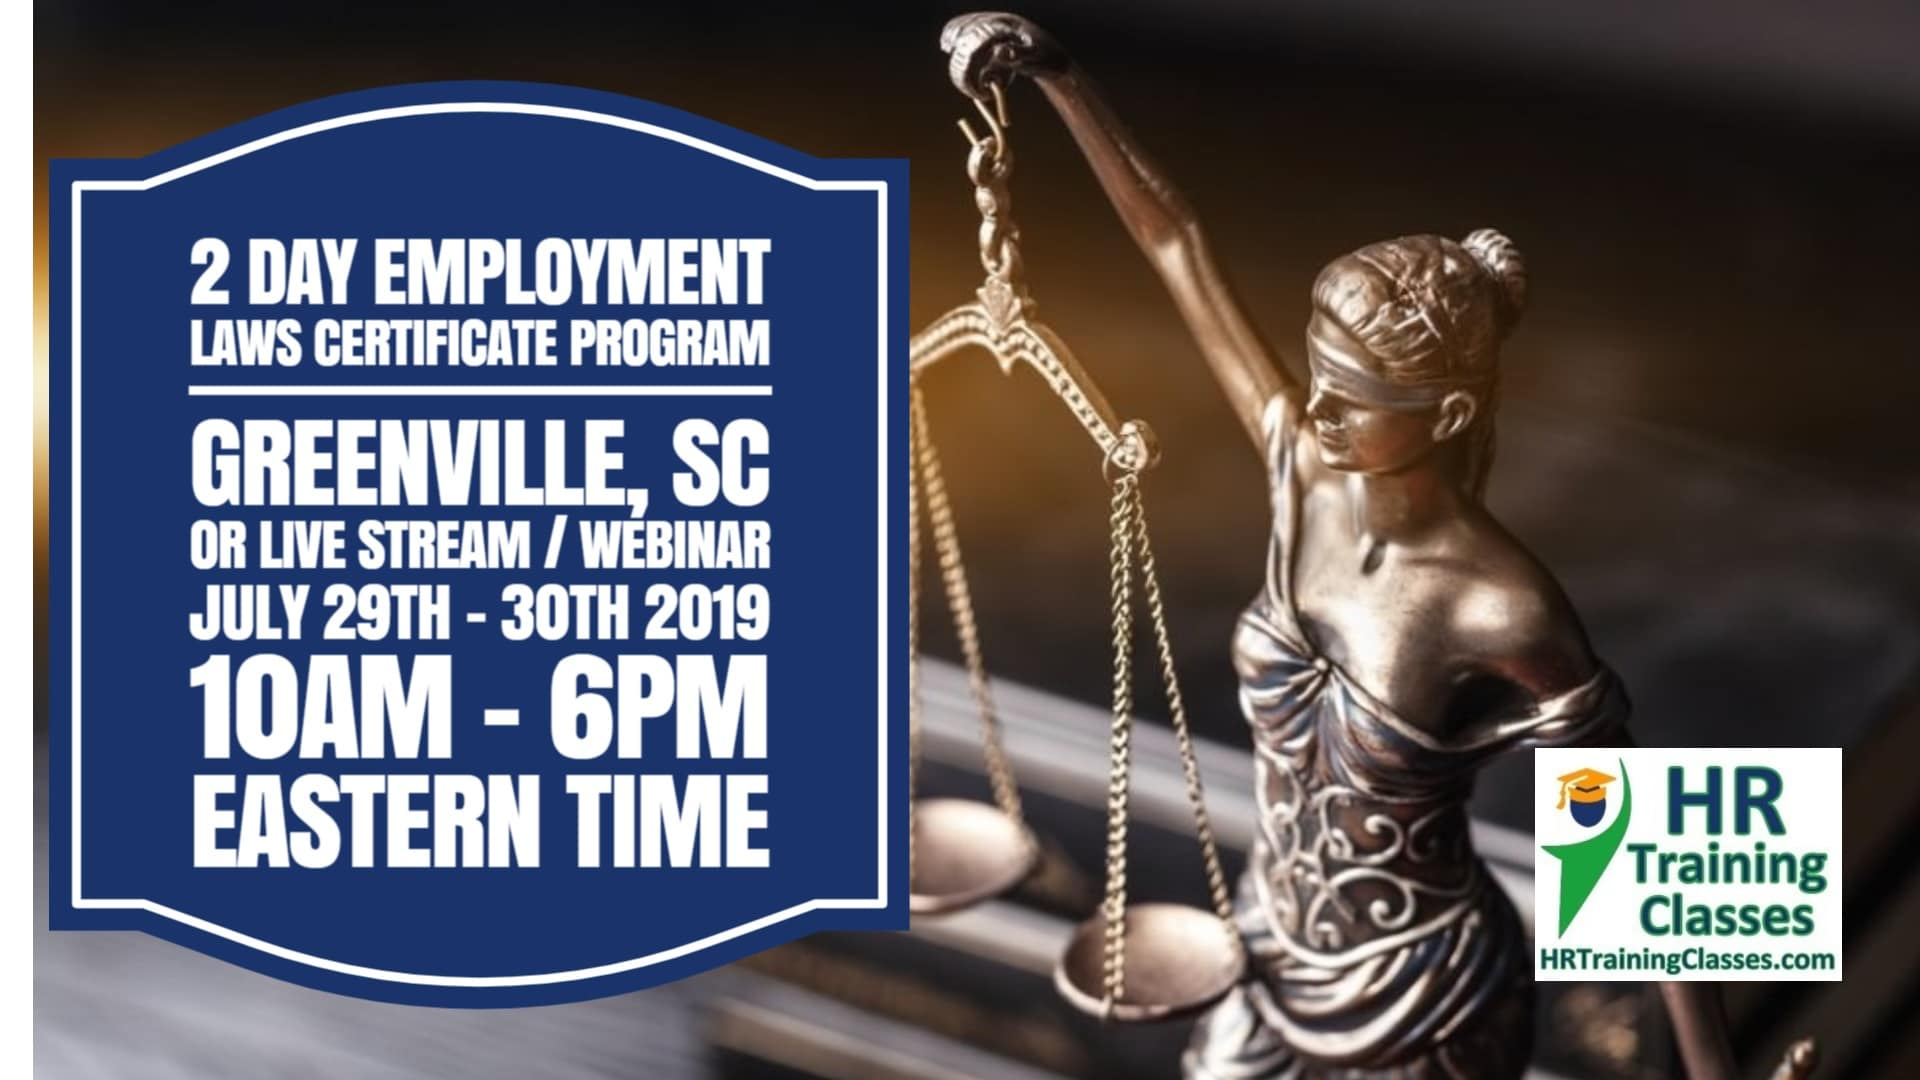 2 Day Employment Laws Certificate Program with Elga Lejarza-Penn in Greenville, SC or join us online via Live Stream Webinar!